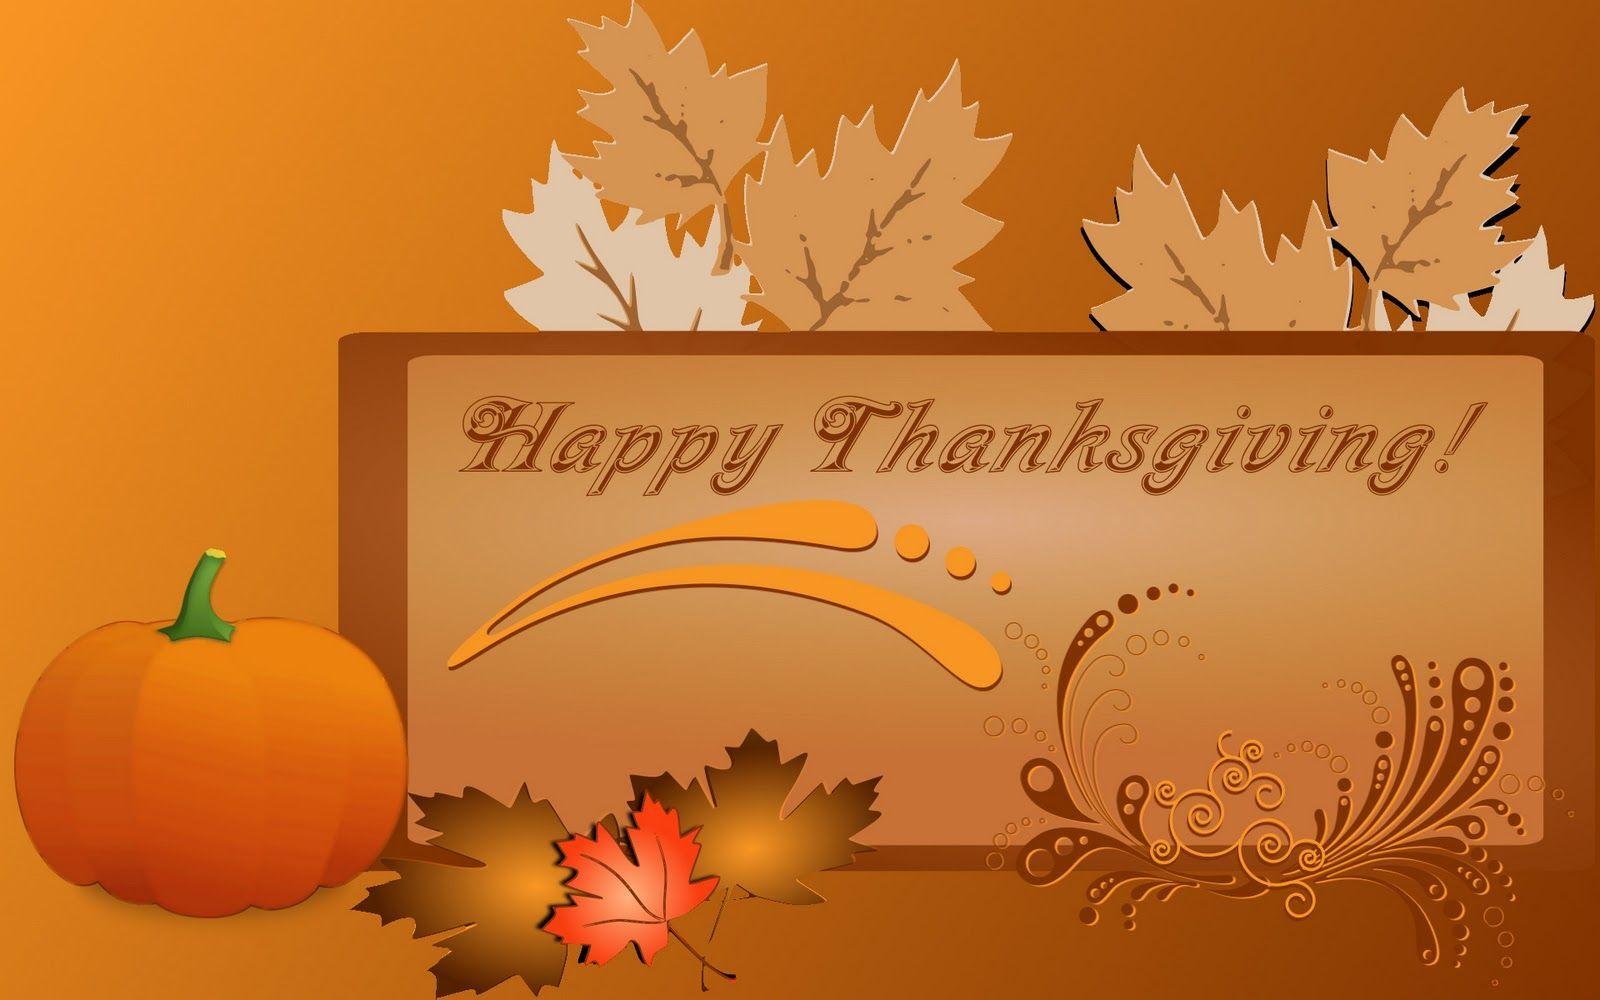 Happy thanksgiving wallpaper for desktop   SF Wallpaper 1600x1000